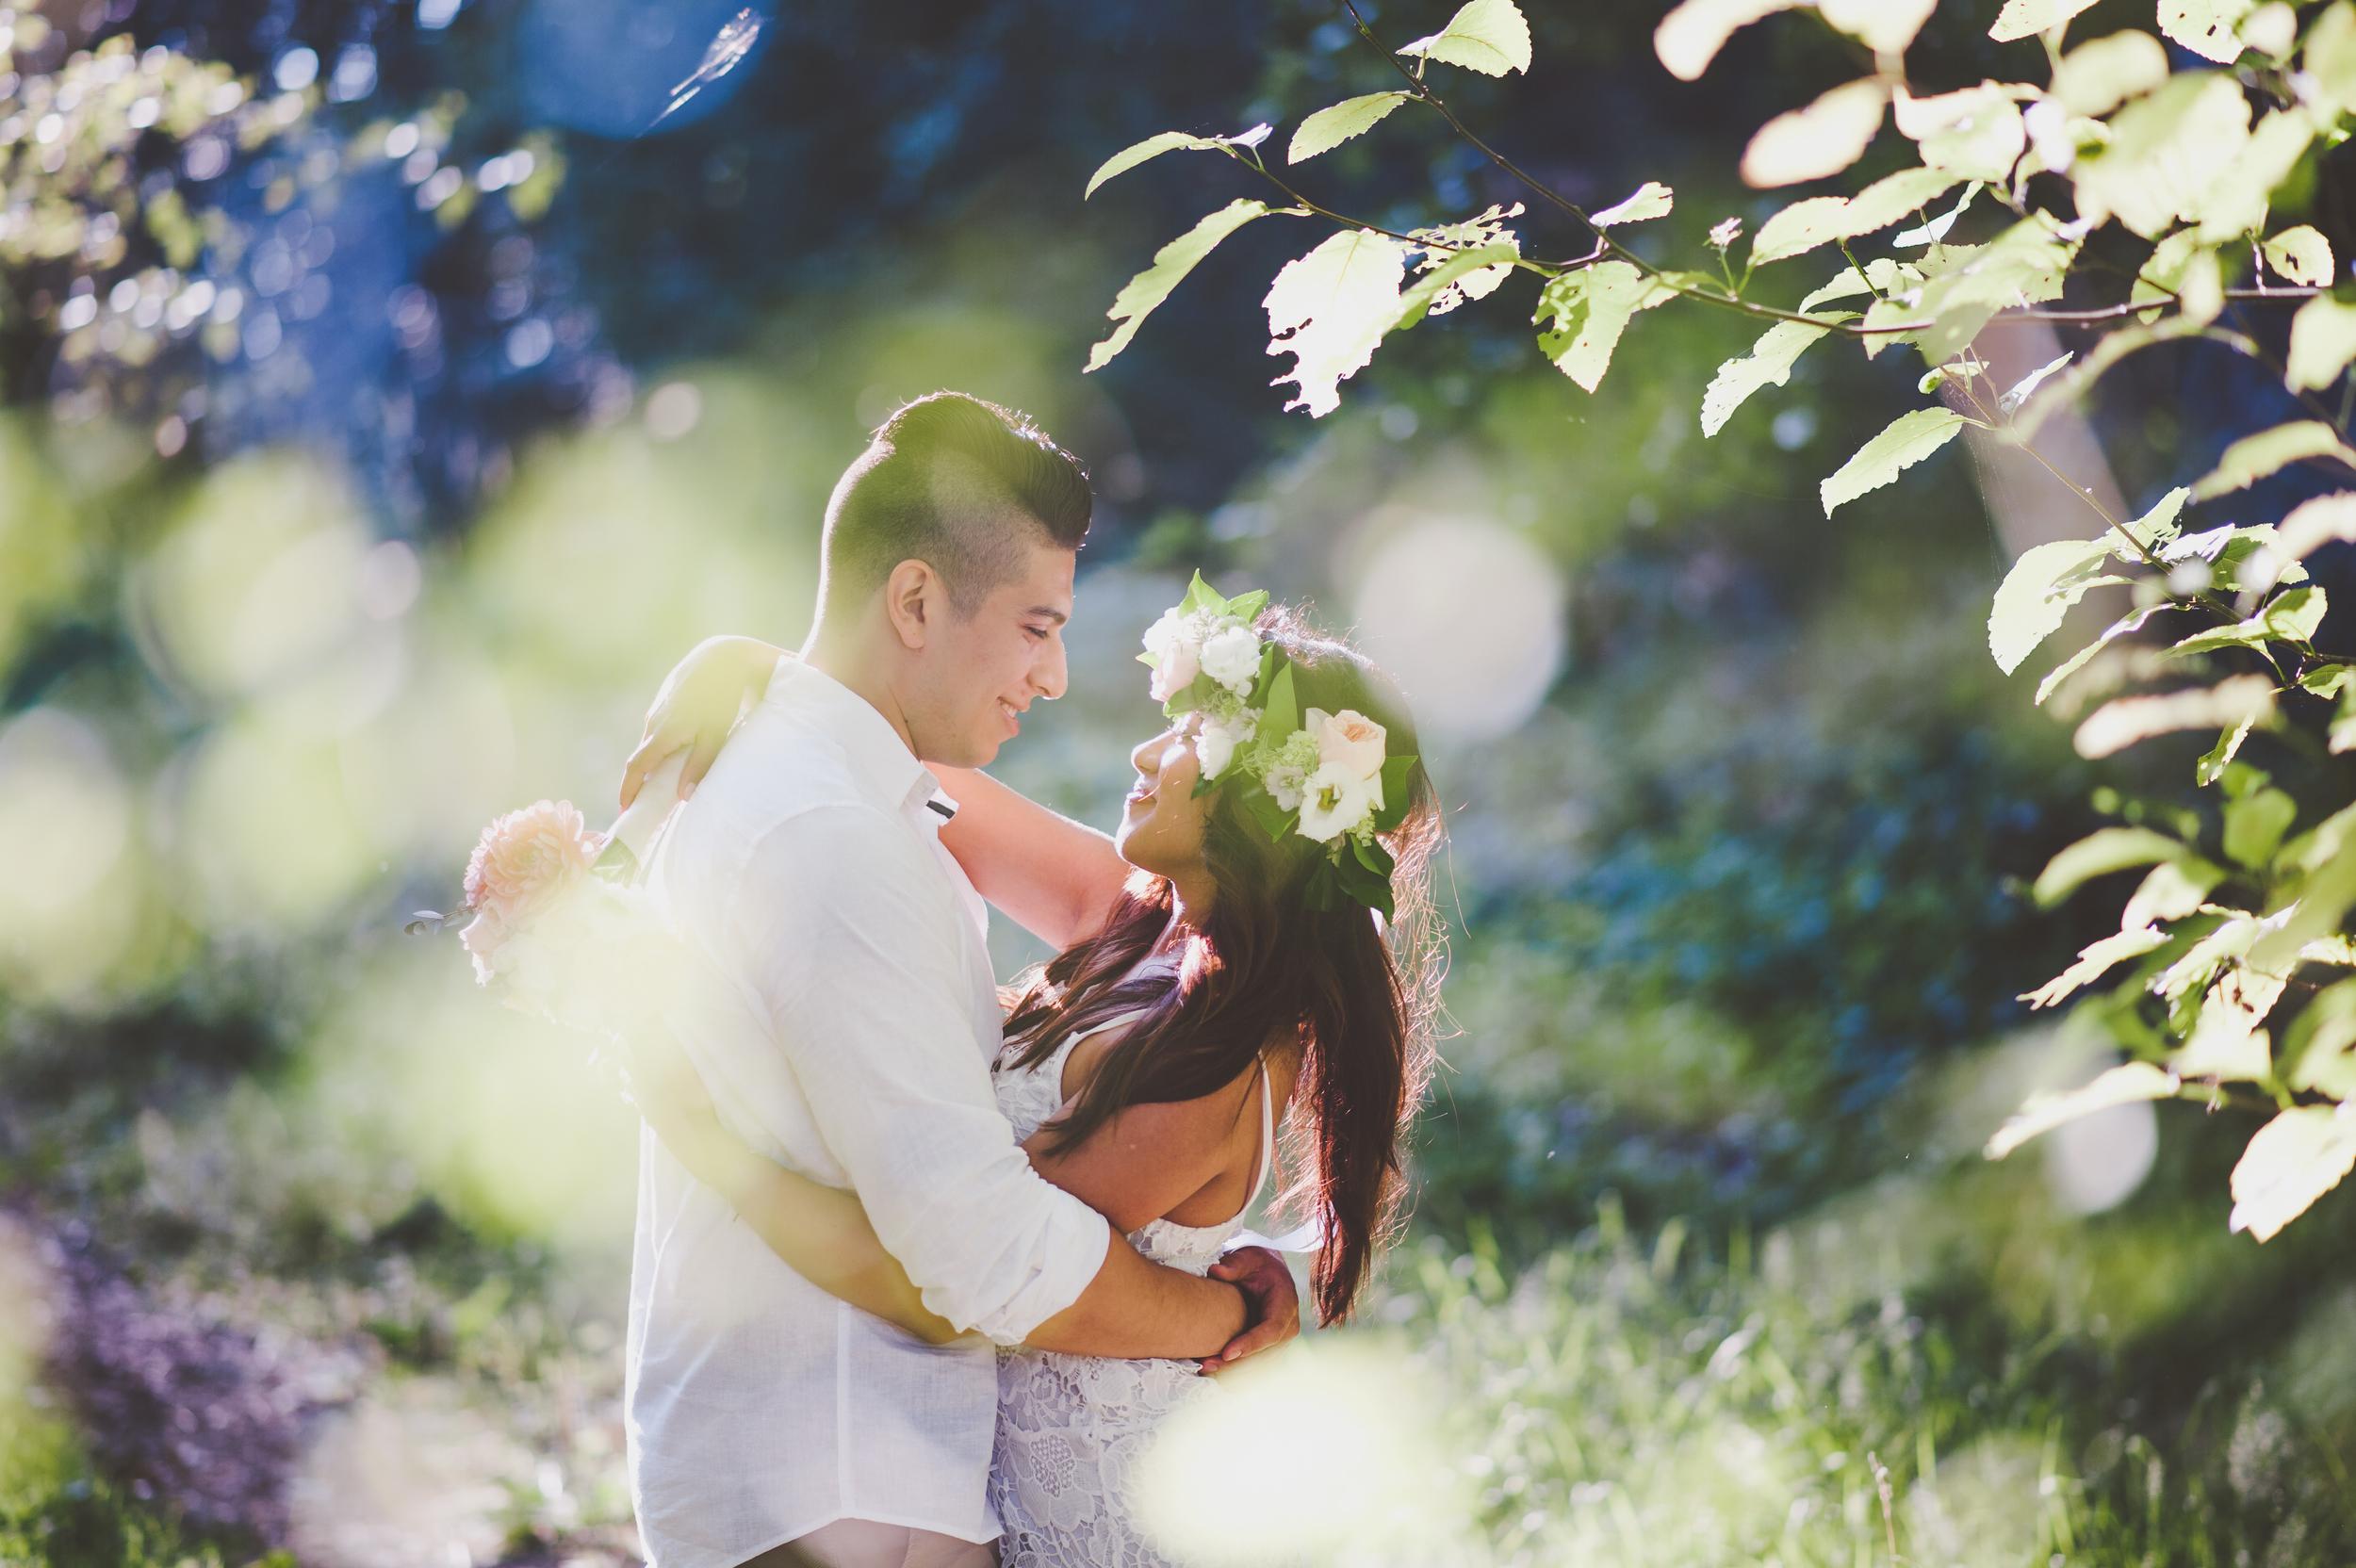 Ricardo & Stephanie - Engagement - © Dallas Kolotylo Photography - 67.jpg